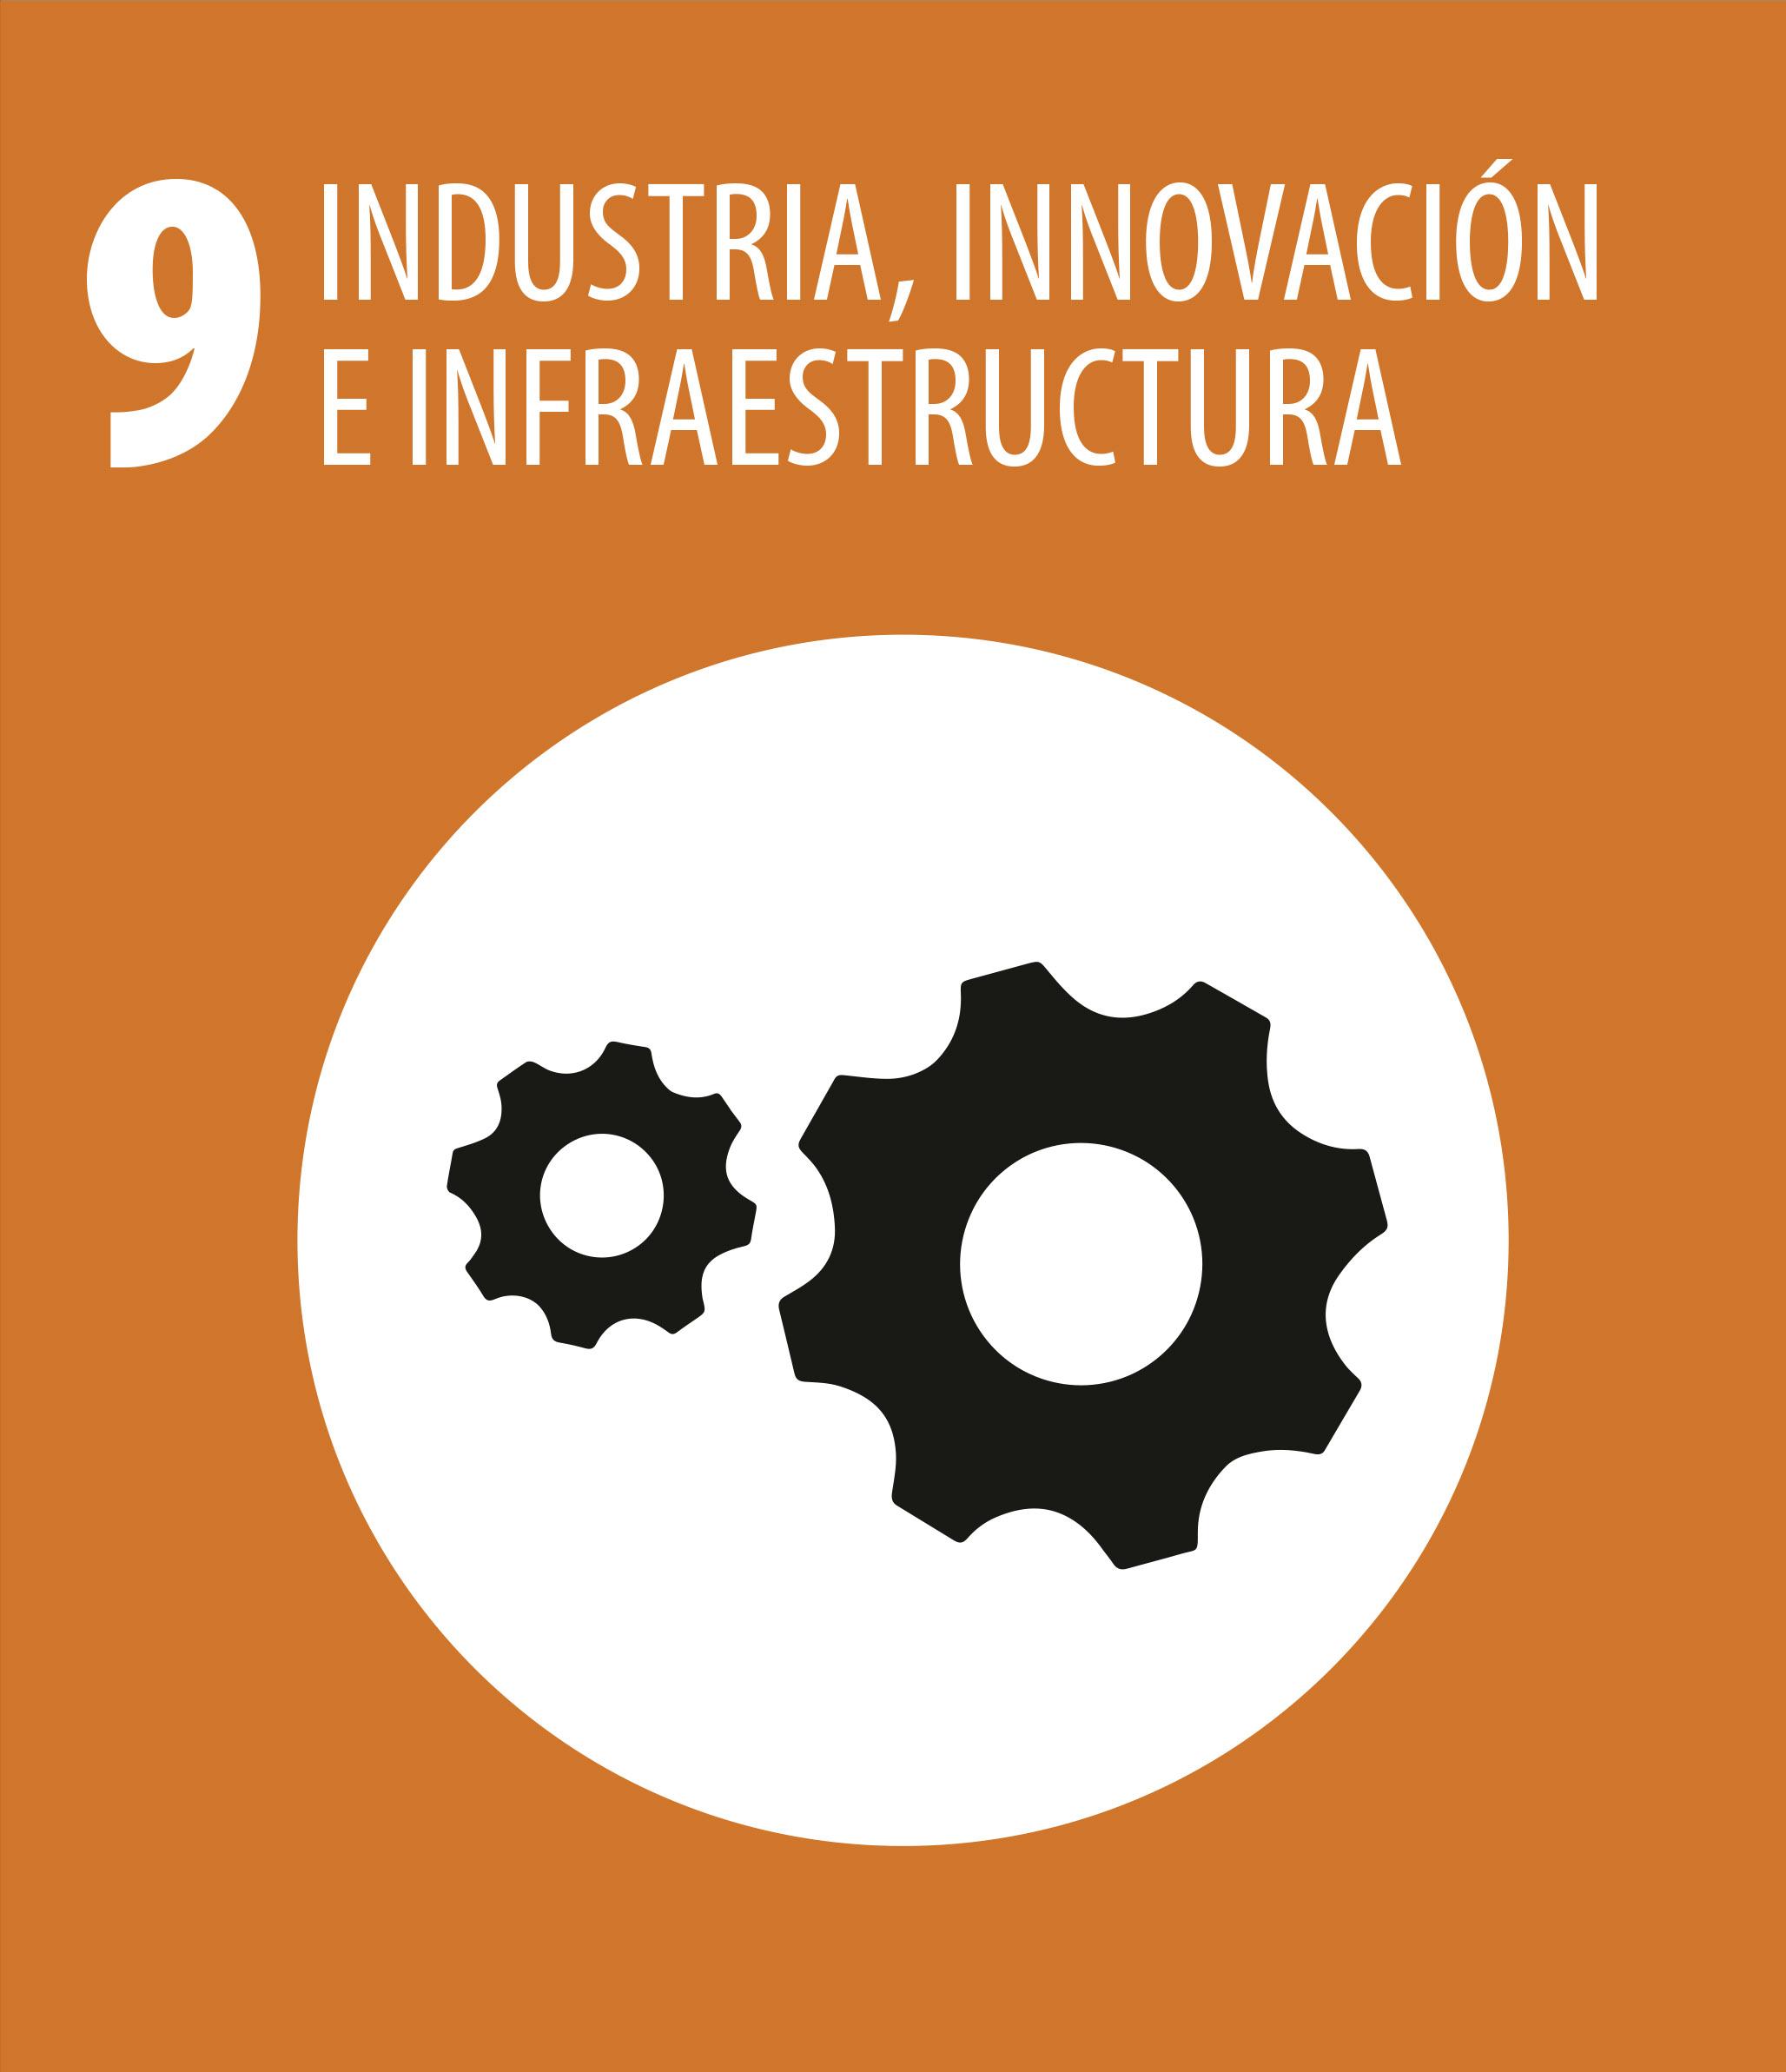 ODS 9 Industria innovacion infraestructura